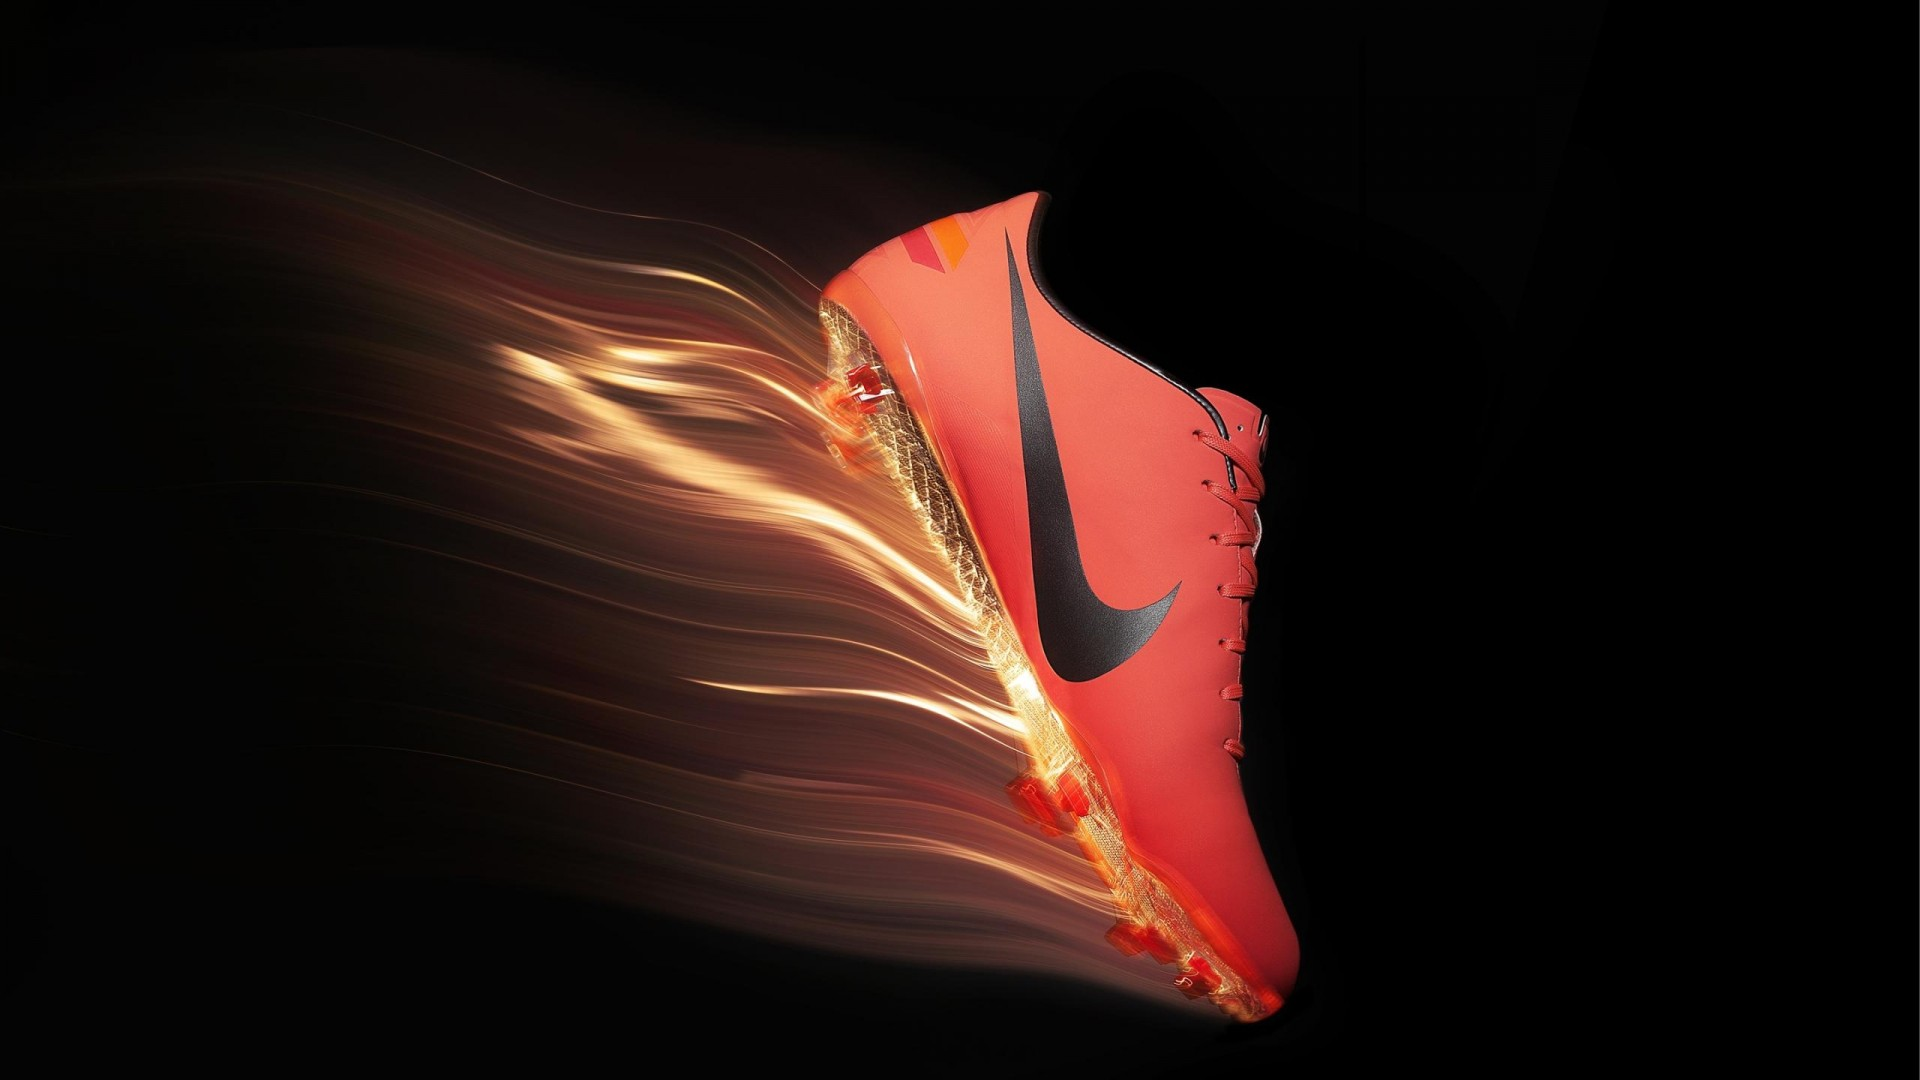 Nike Football Shoes Wallpaper Desktop 14265 Wallpaper WallpaperLepi 1920x1080